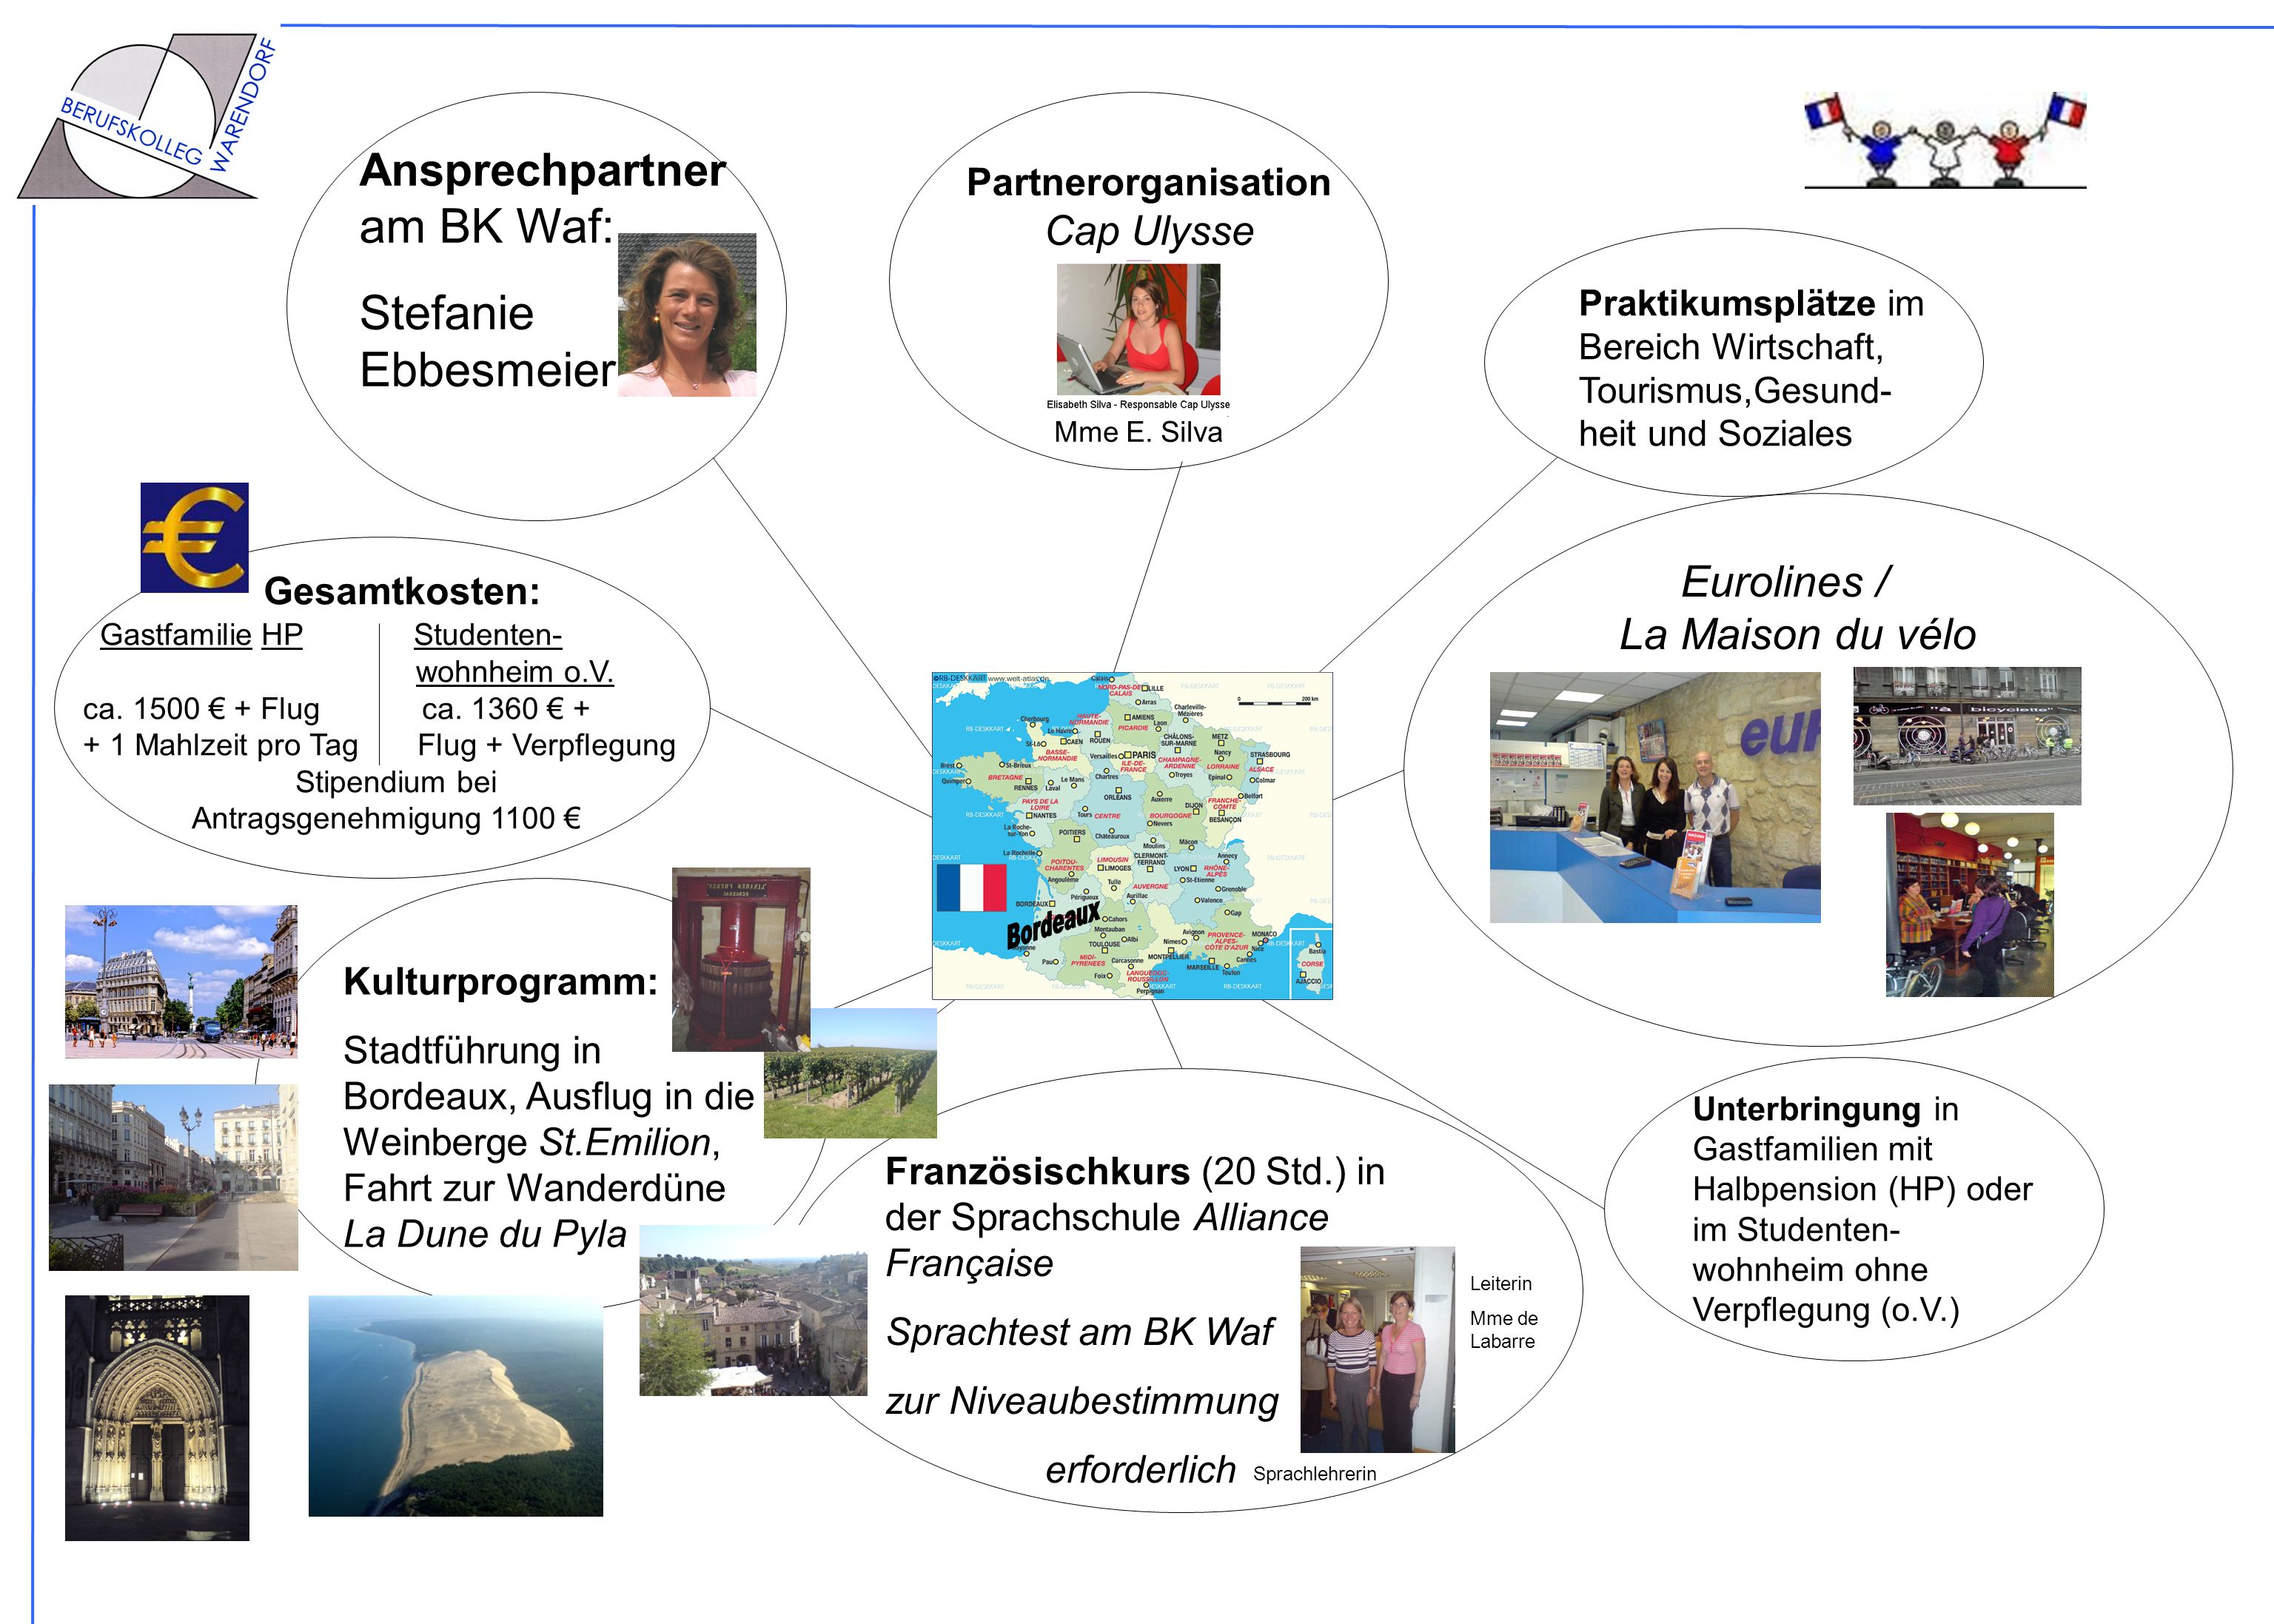 Partnerorganisation Cap Ulysse